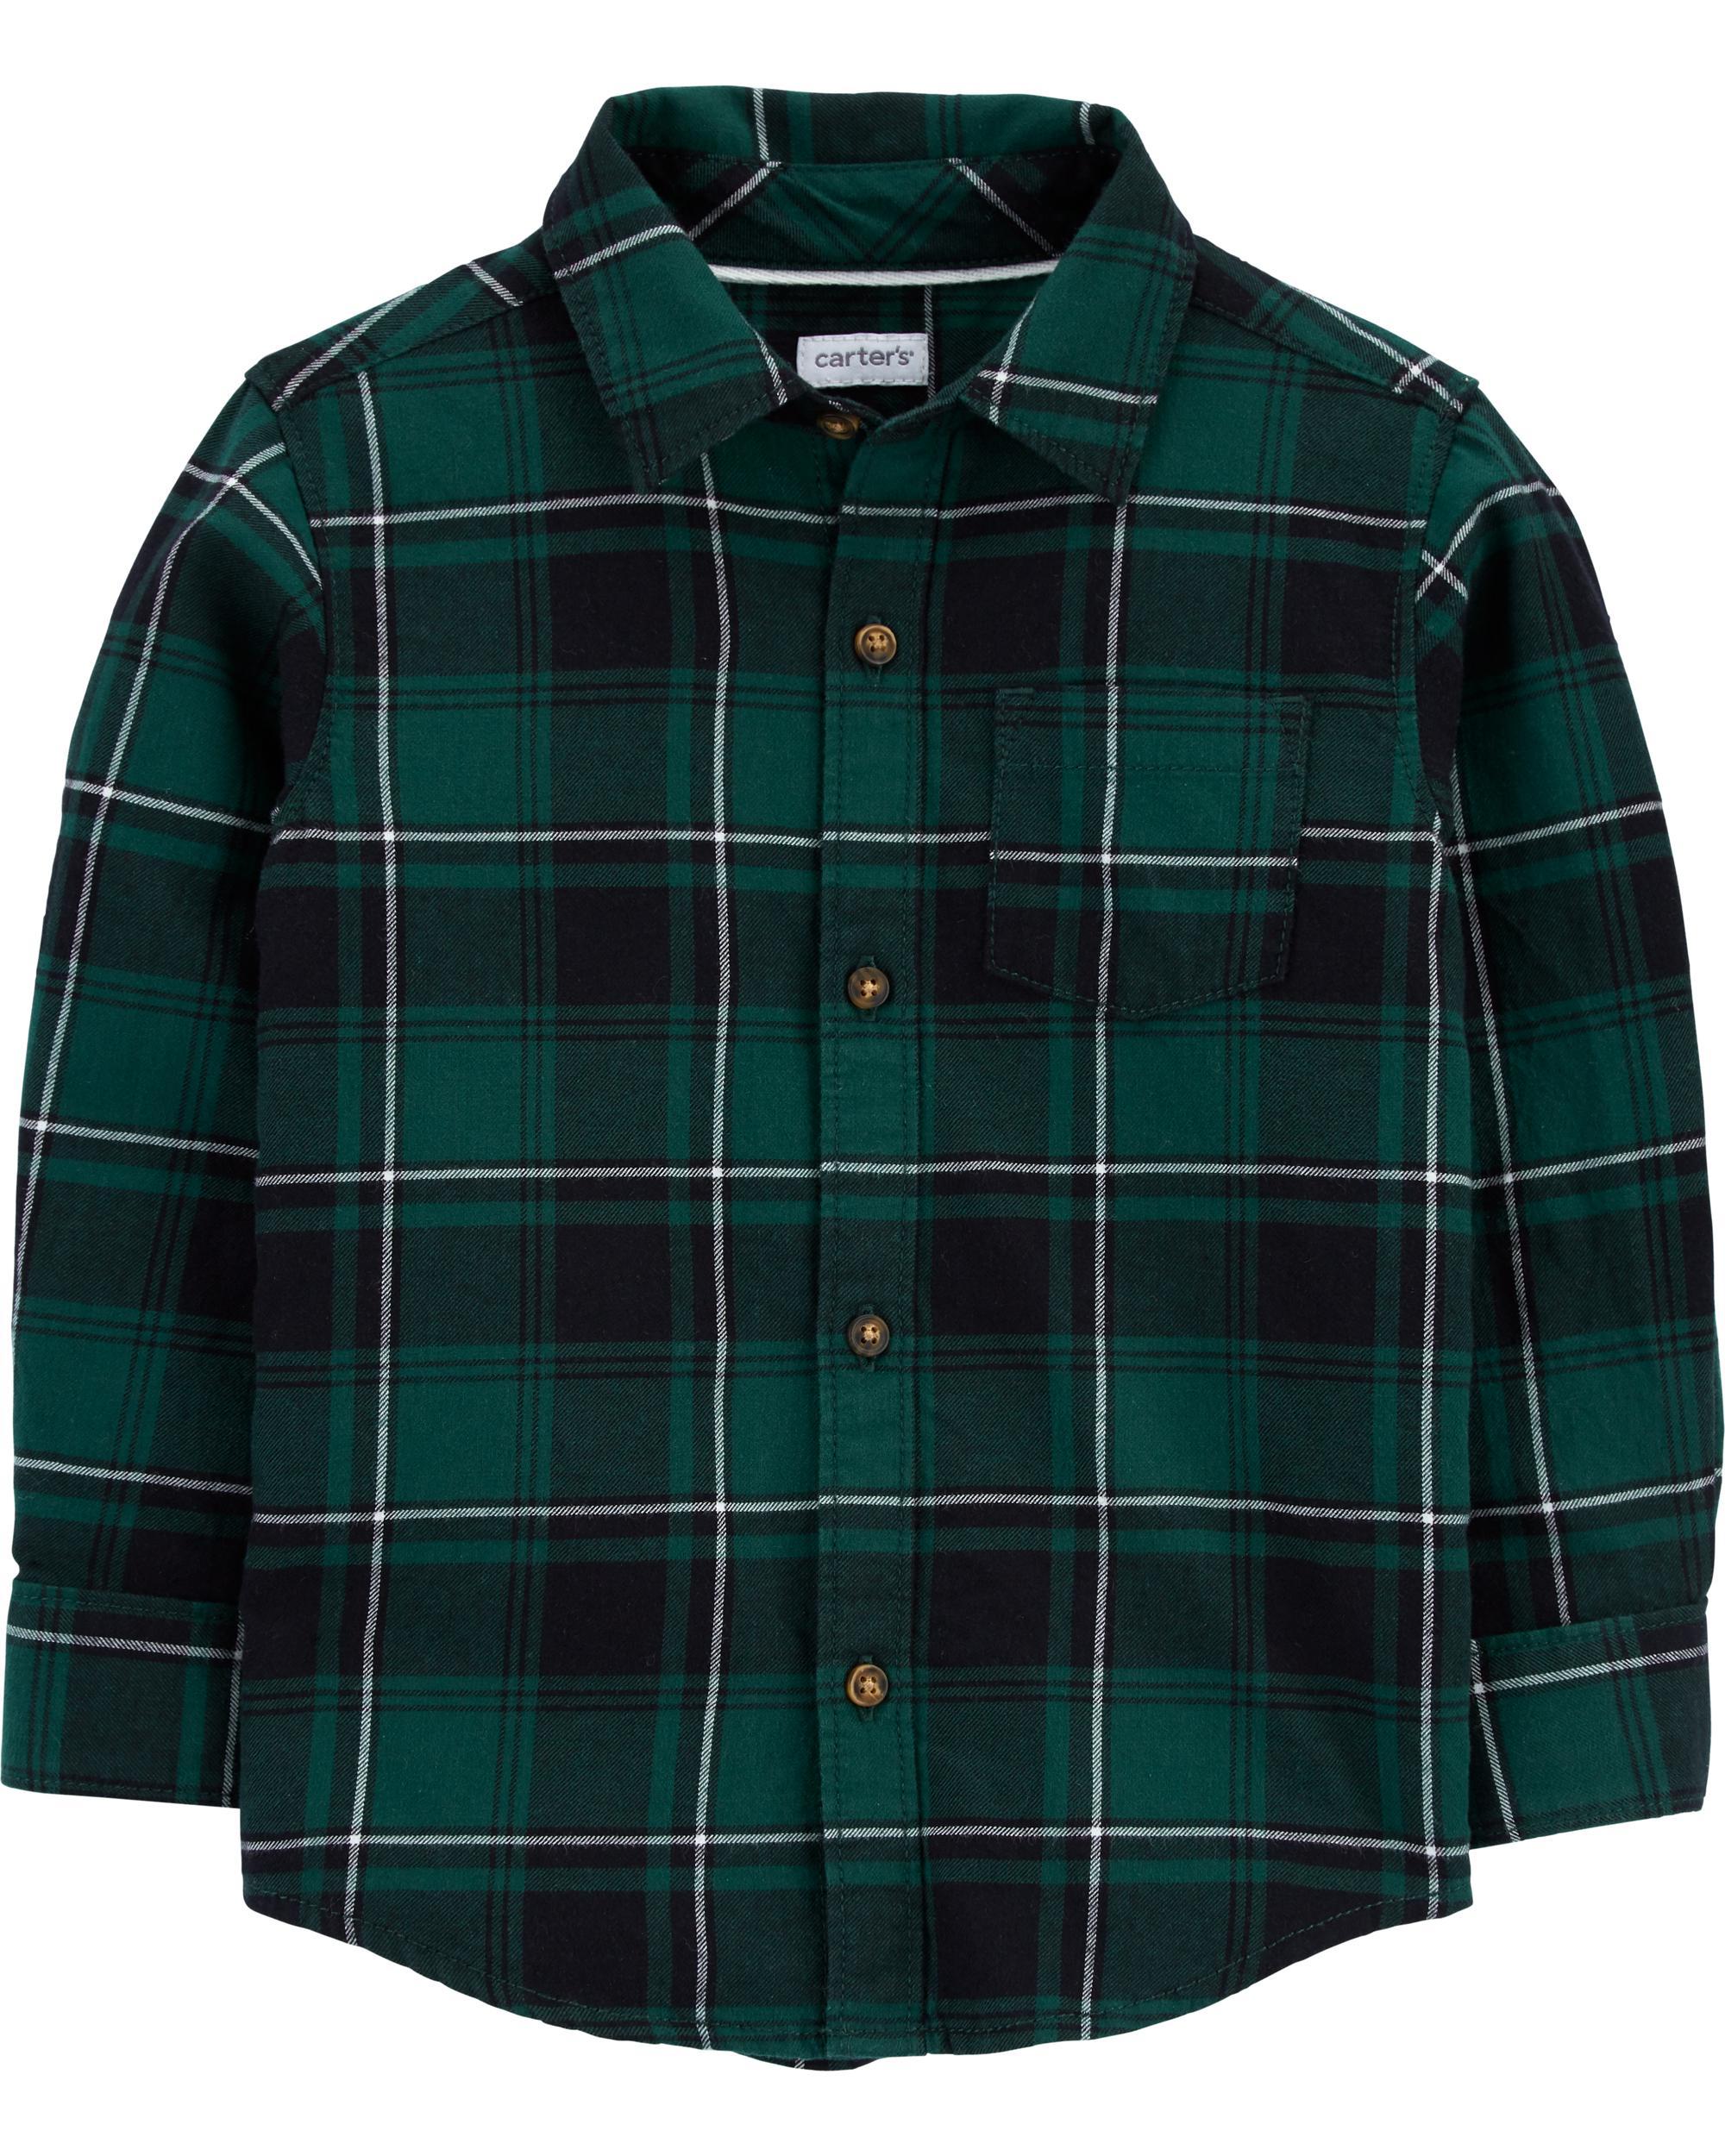 Carter's Camasa cadrilata verde imagine